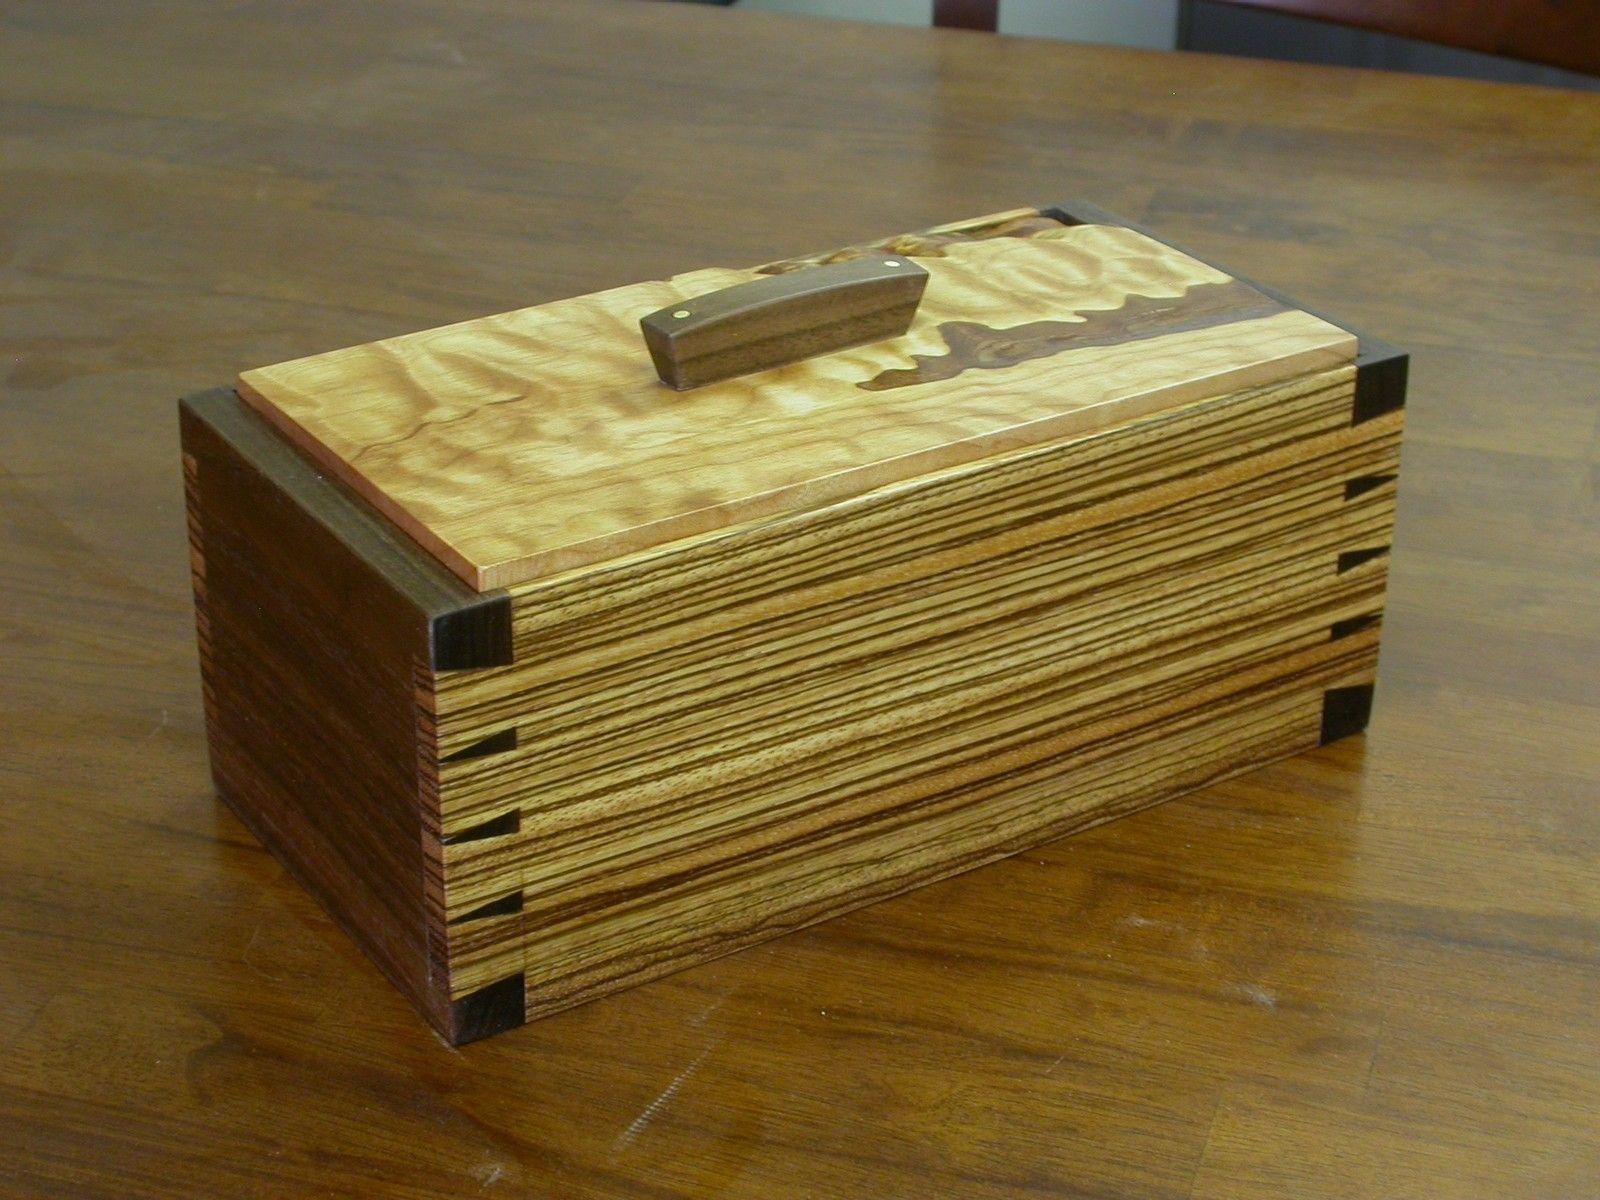 zebra wood box | small woodworking projects | small wood box